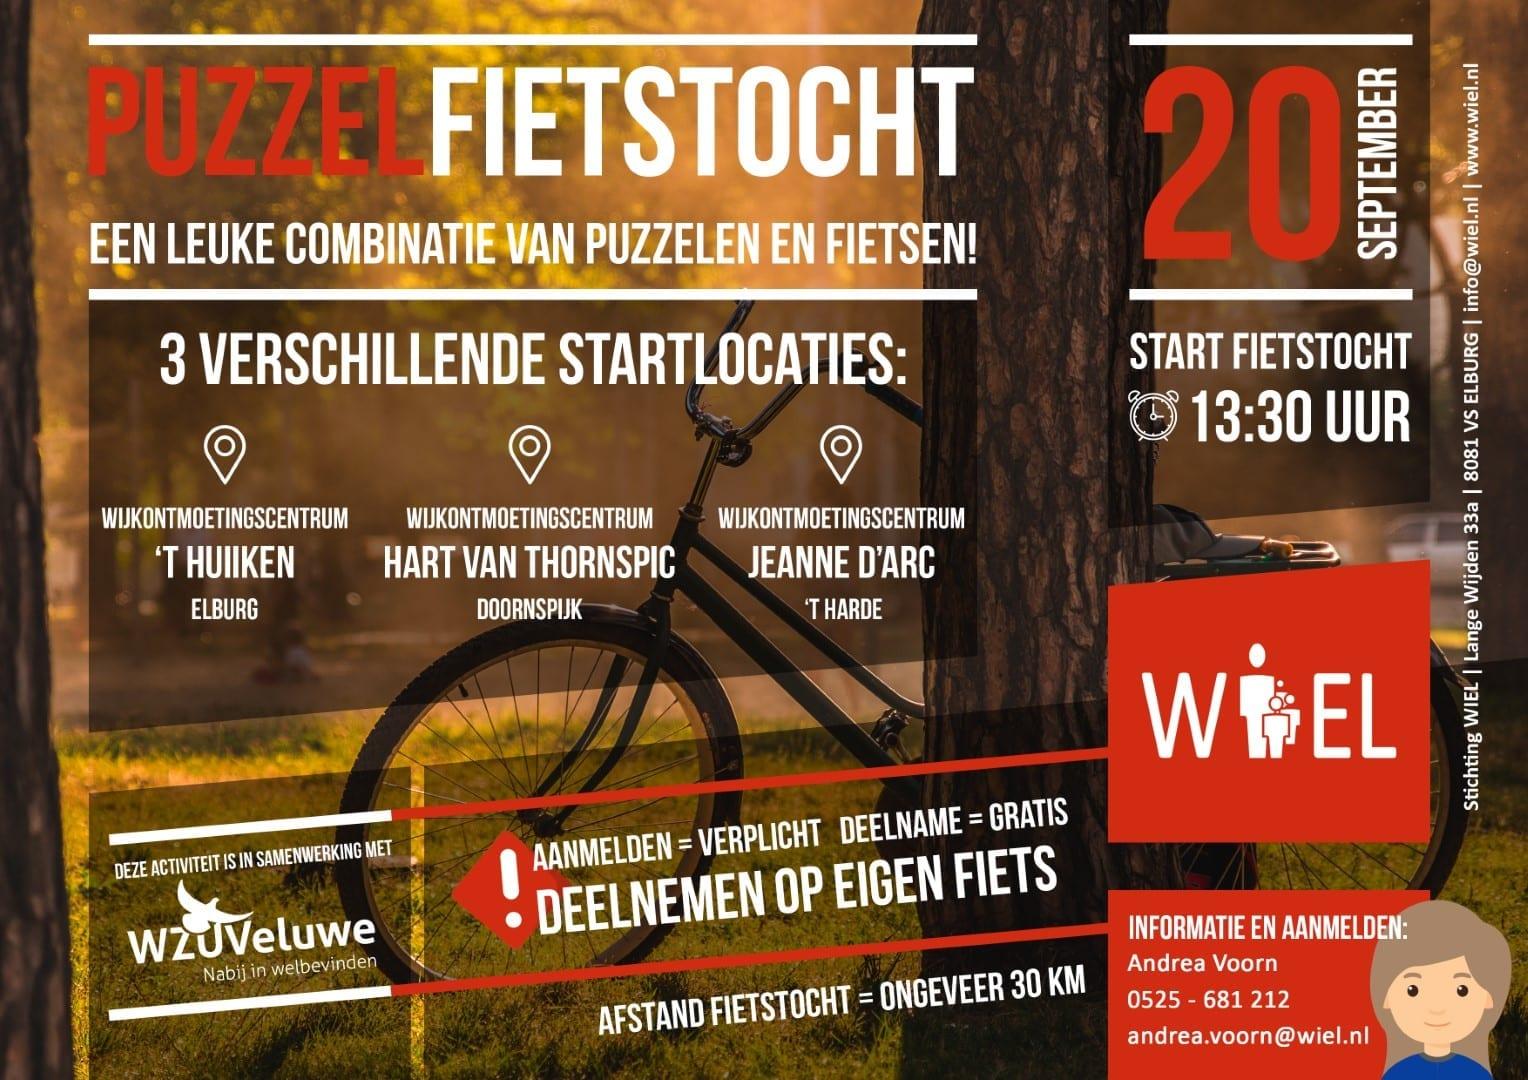 Puzzelfietstocht - Stichting WIEL